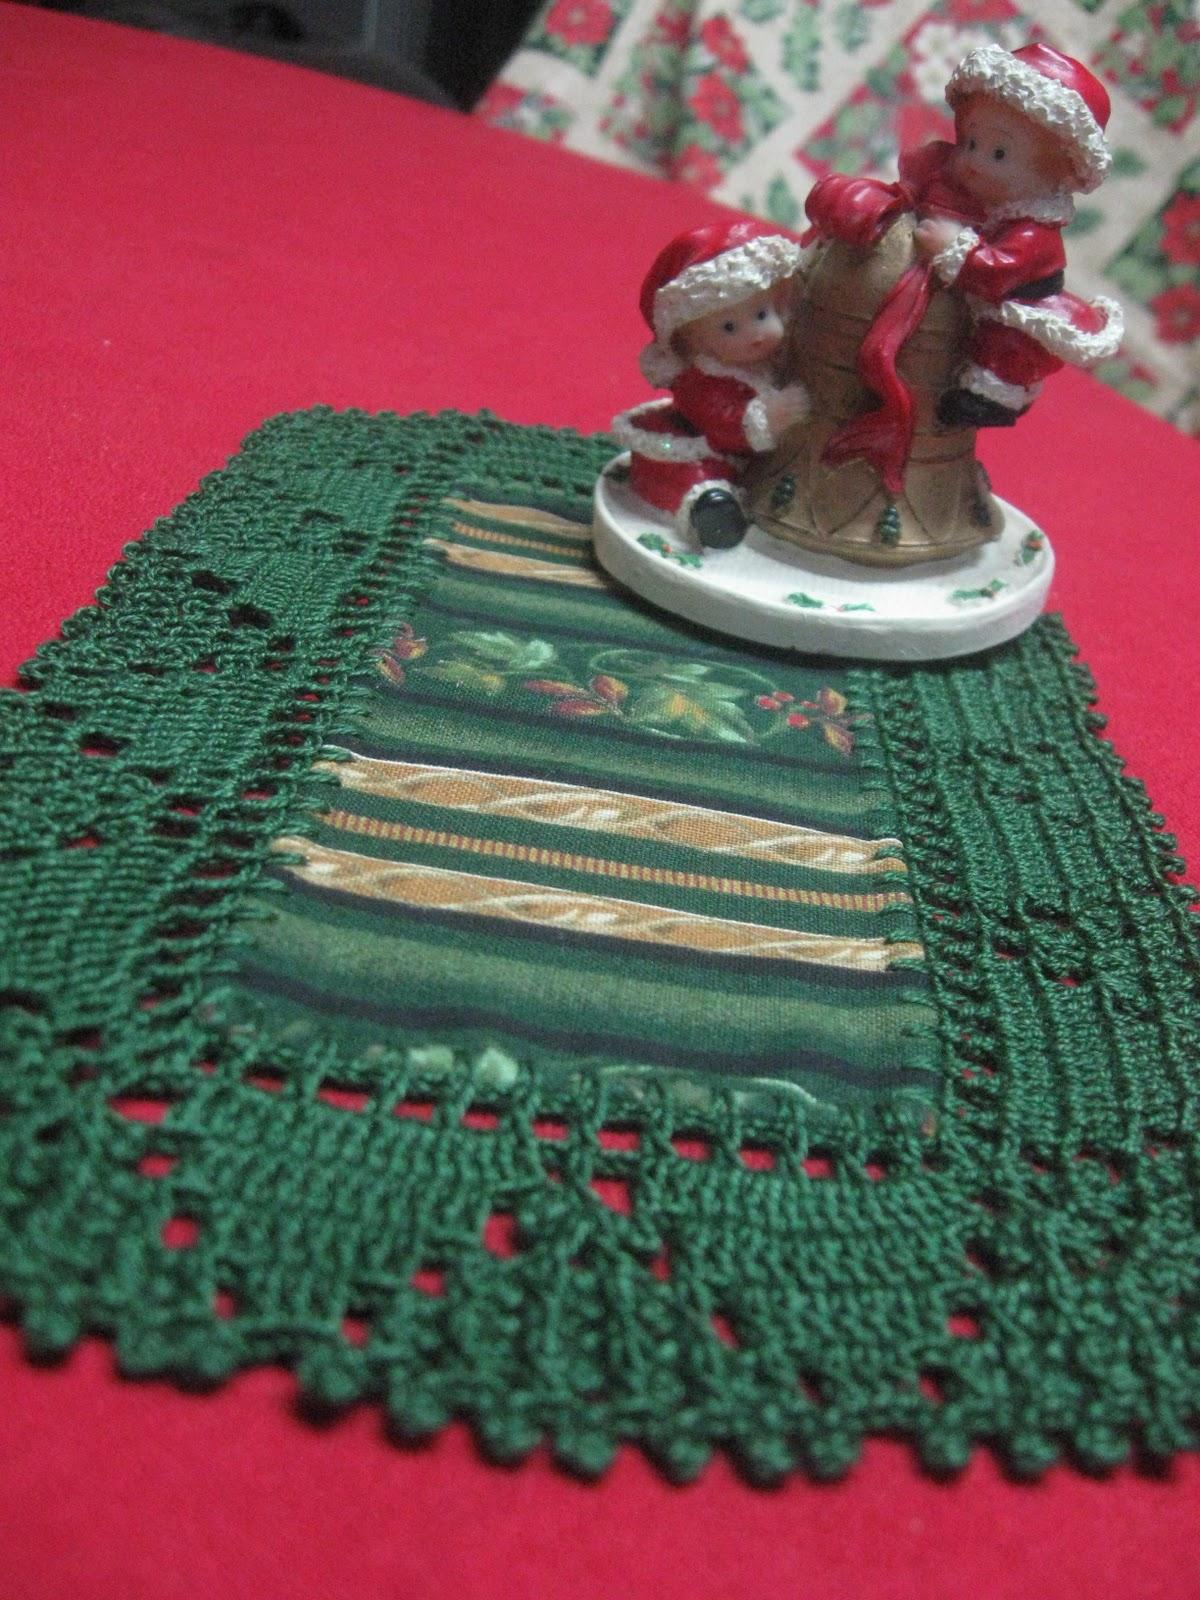 A Mano Tapetes Navide Os Con Borde Tejido A Crochet -> Tapetes Para Sala Tejidos A Crochet